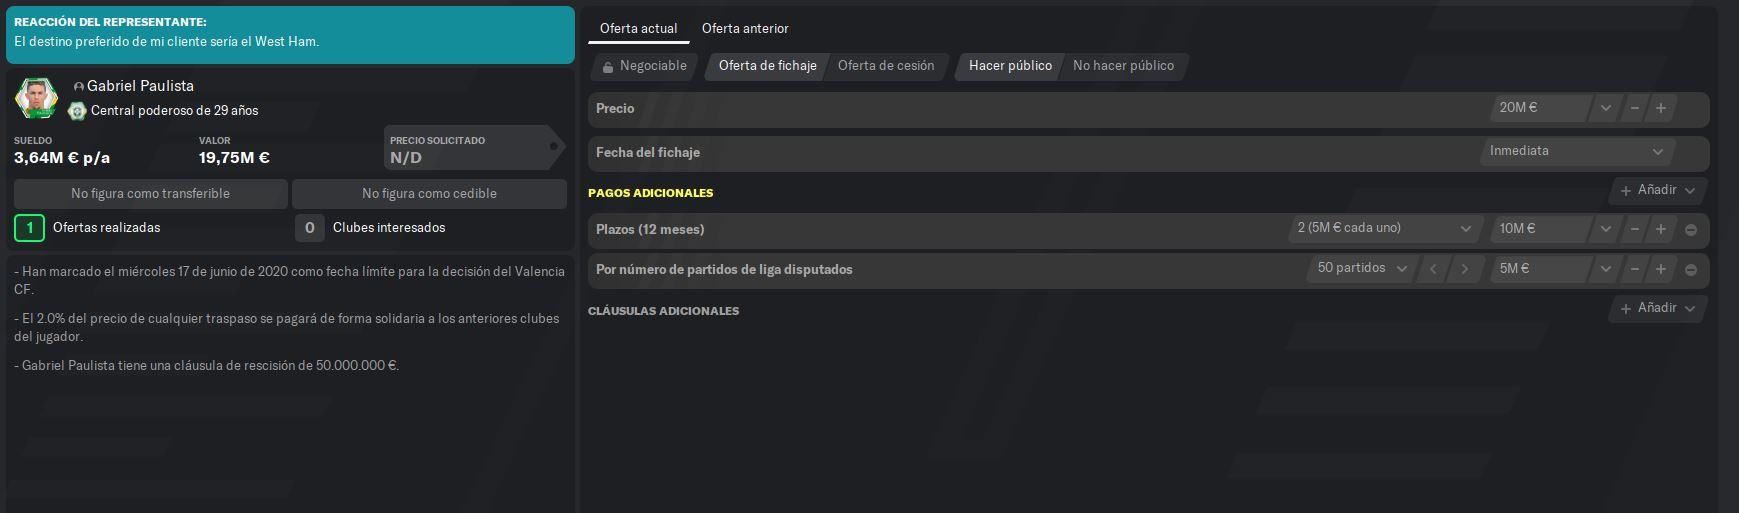 Oferta-final-por-Paulista.jpg